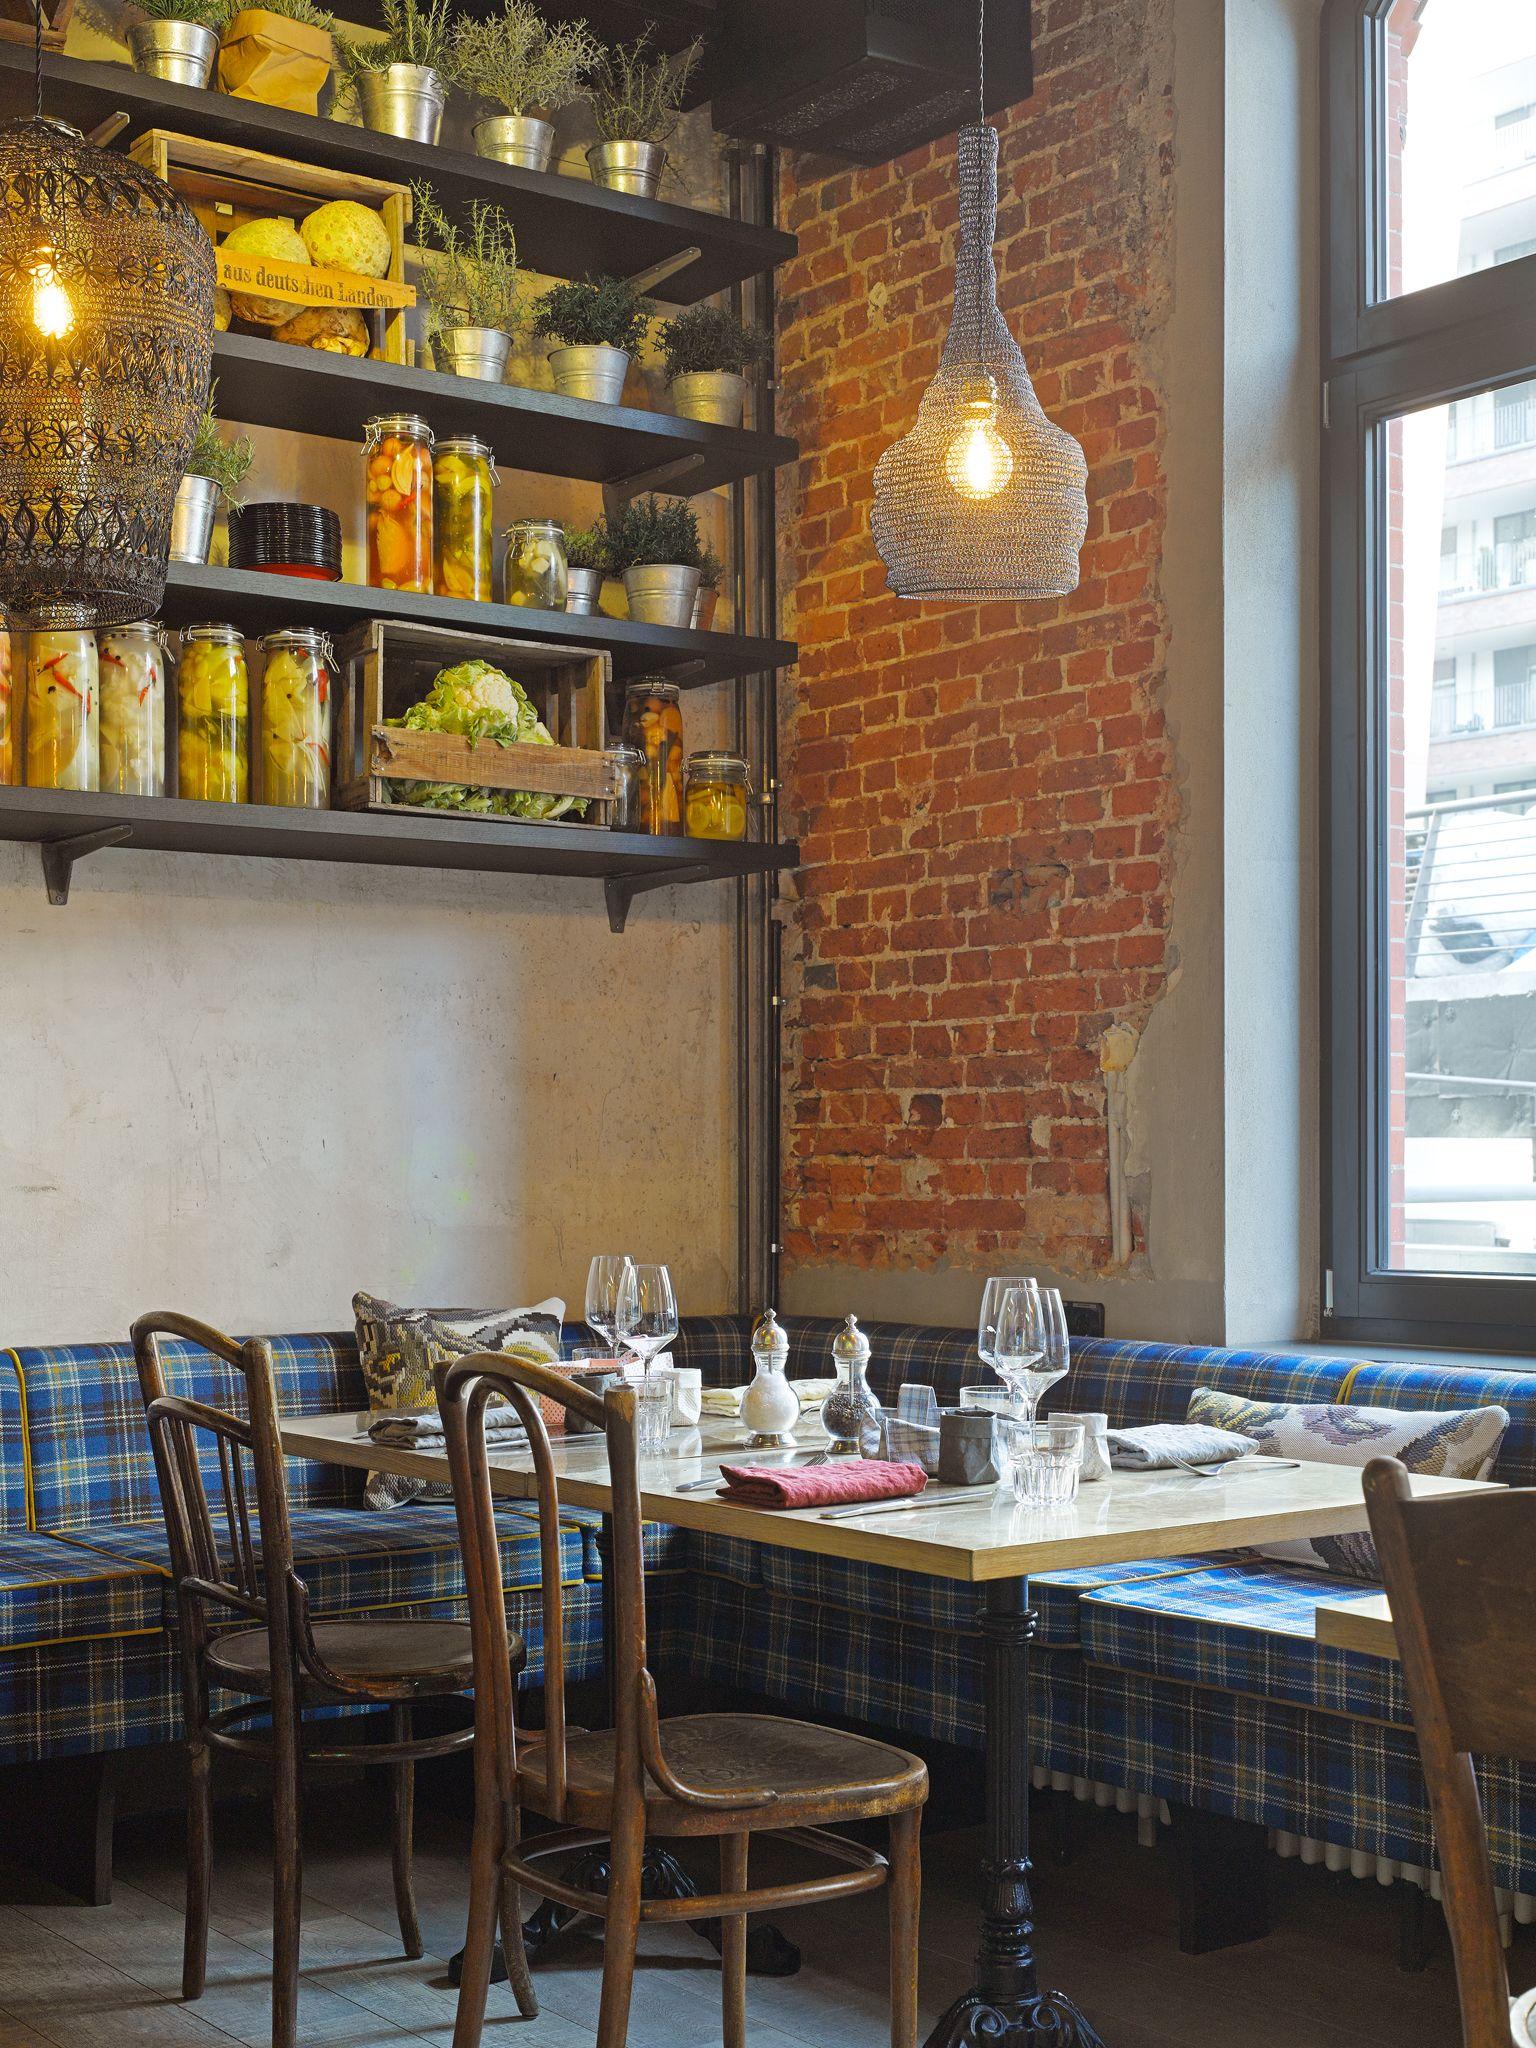 Das neni restaurant im 25hours hotel hamburg altes hafenamt